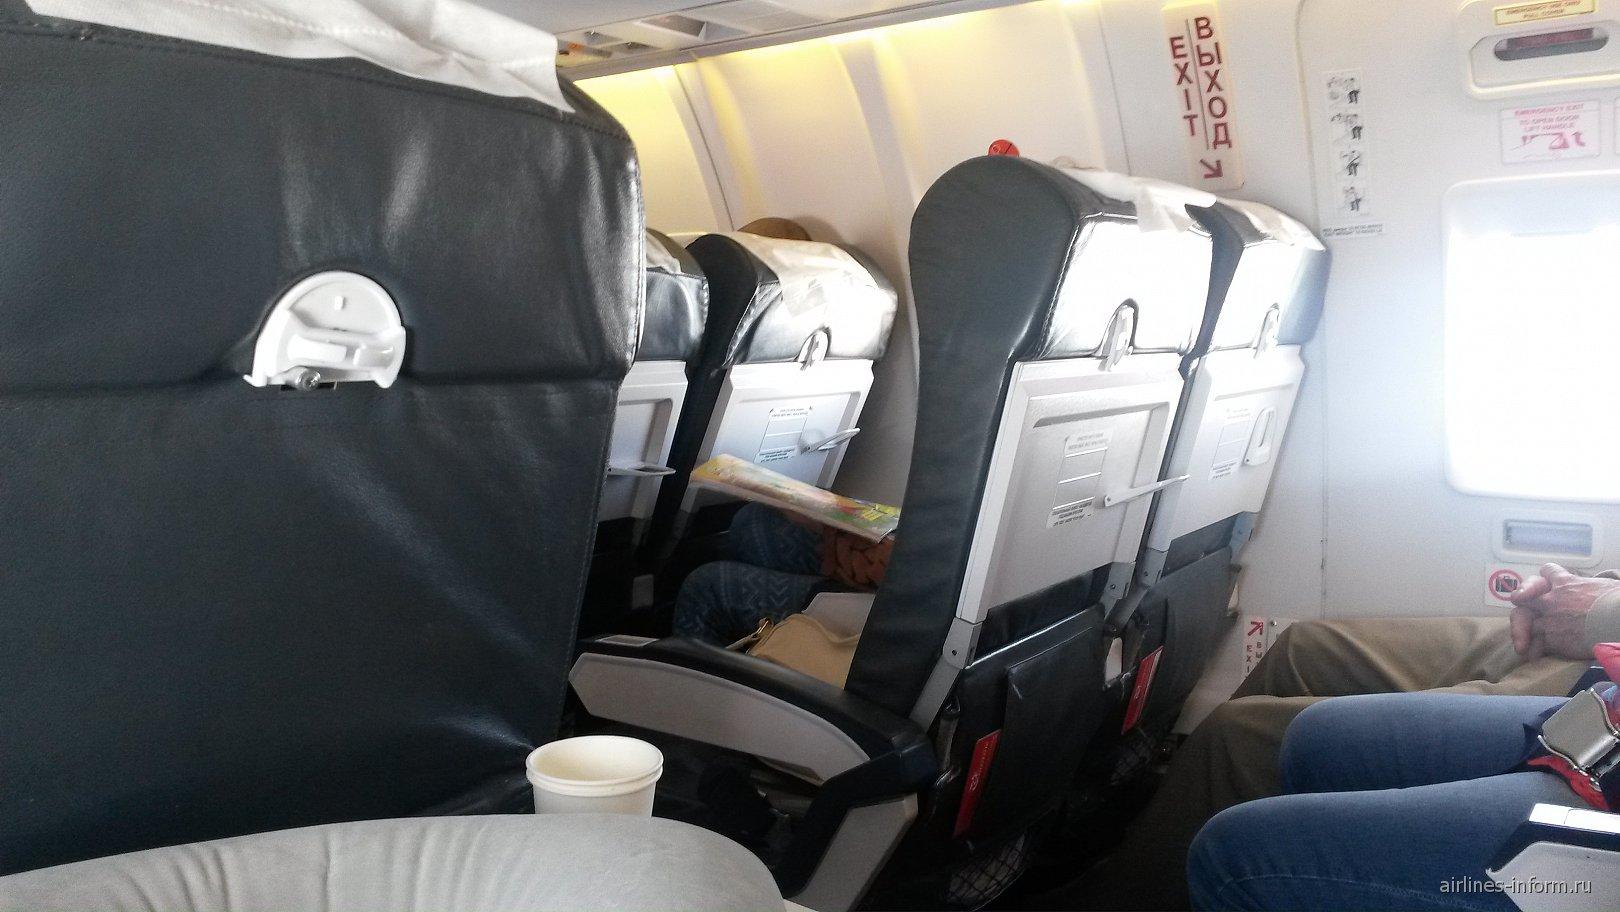 Салон самолета Bombardier CRJ200 авиакомпании Руслайн